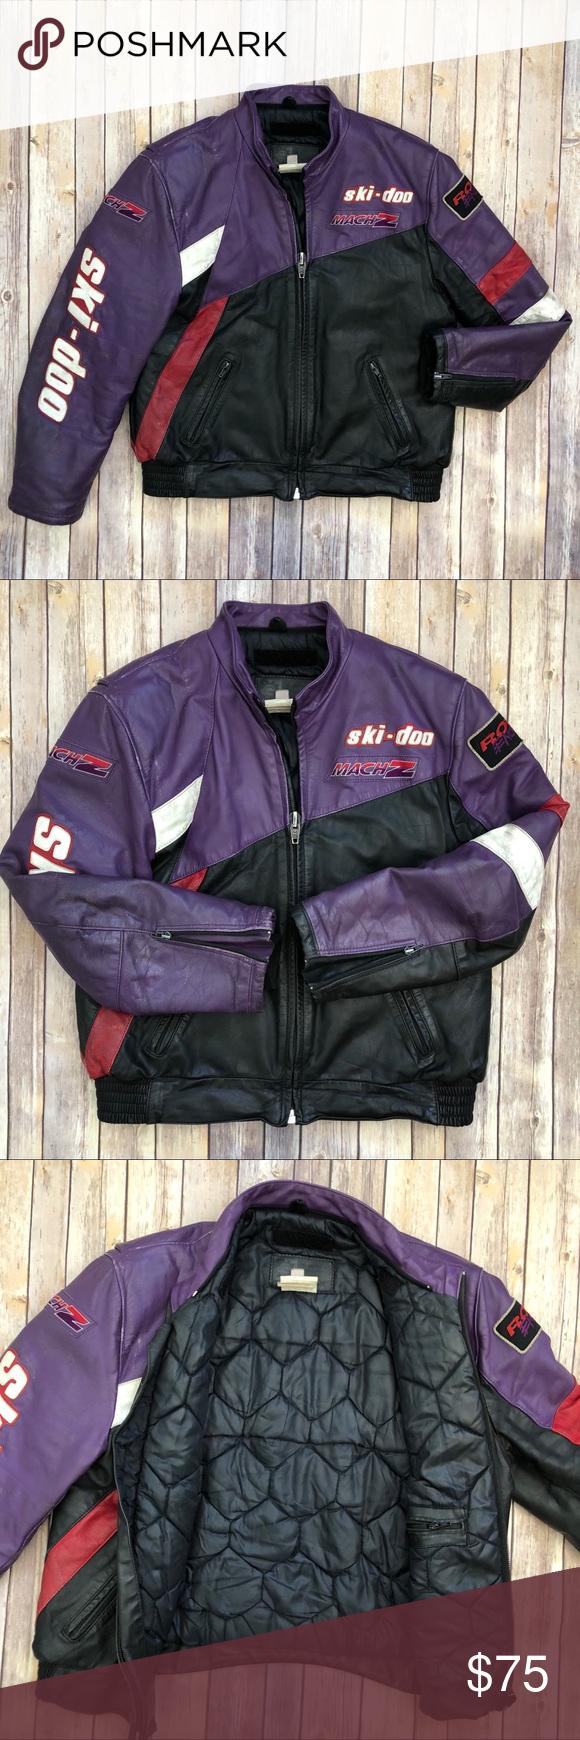 VINTAGE SKIDOO MACH Z Snowmobiling Jacket M L Vintage